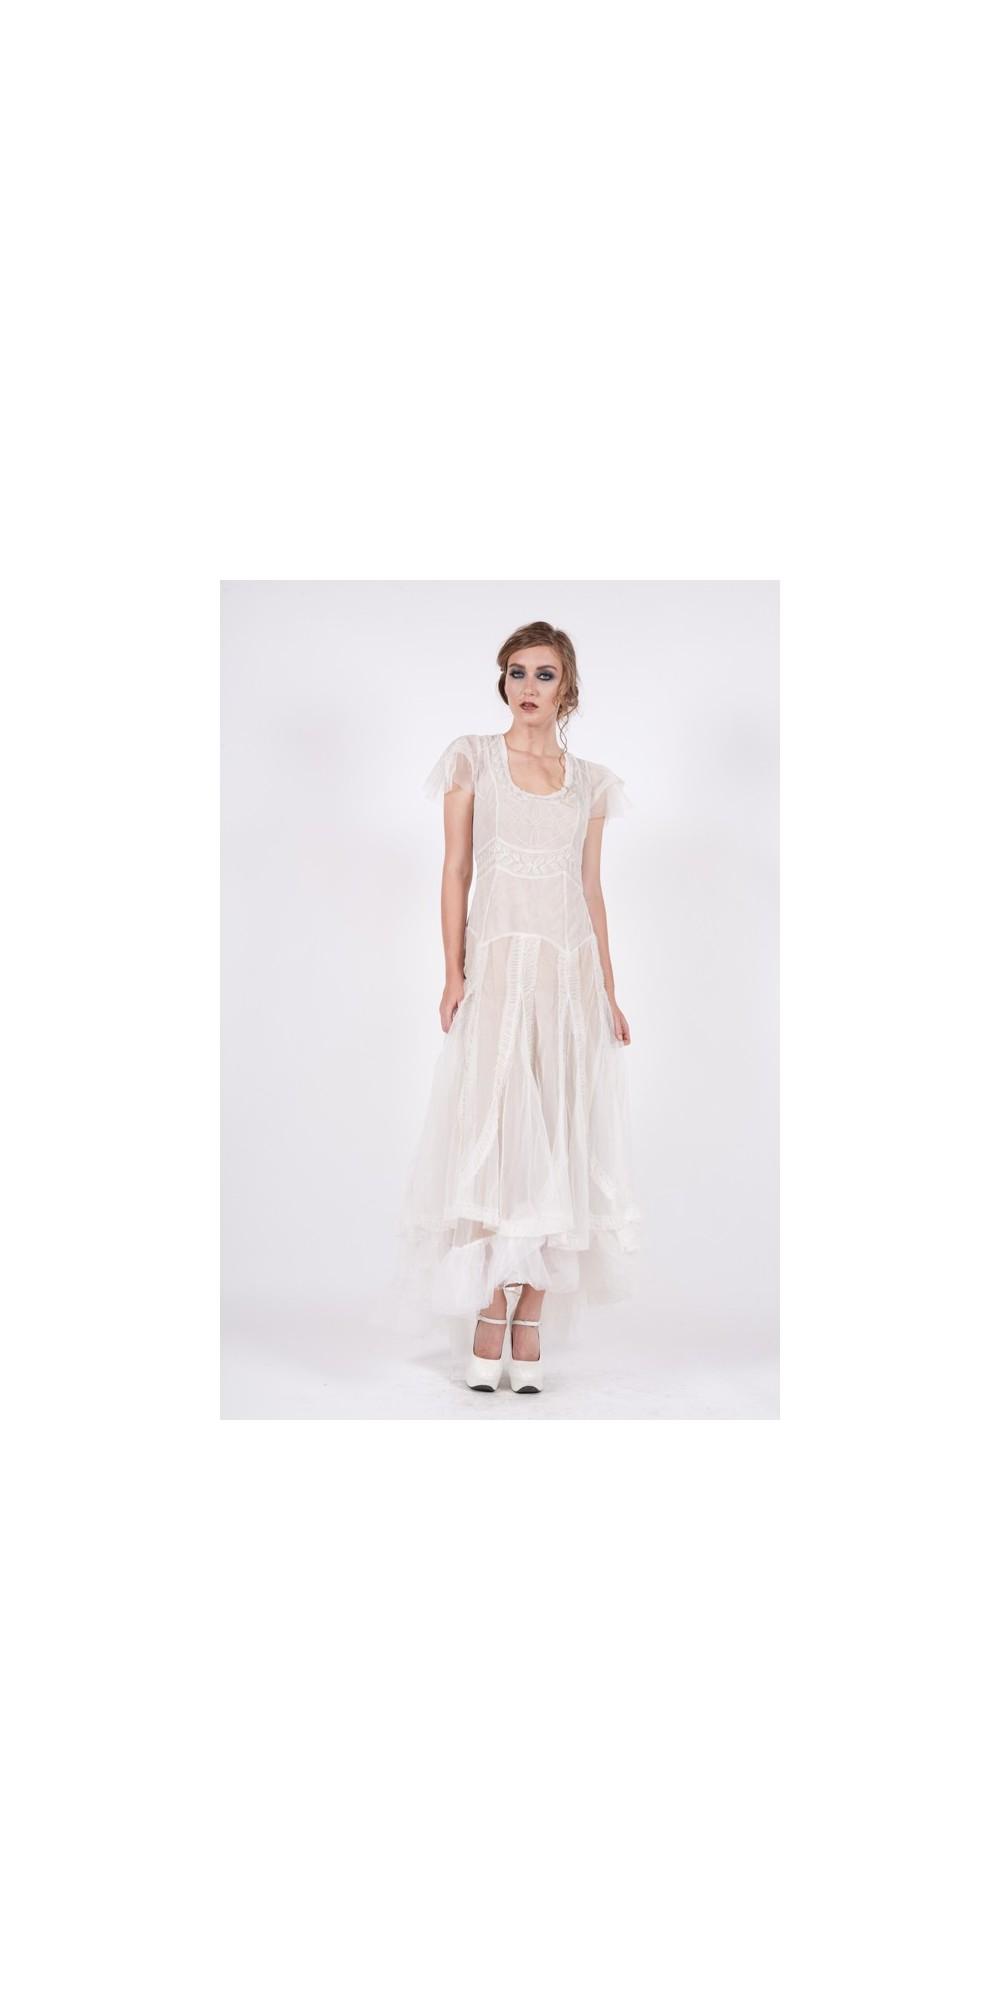 Best Dresses for a Forest-Inspired Wedding | Nataya Dresses